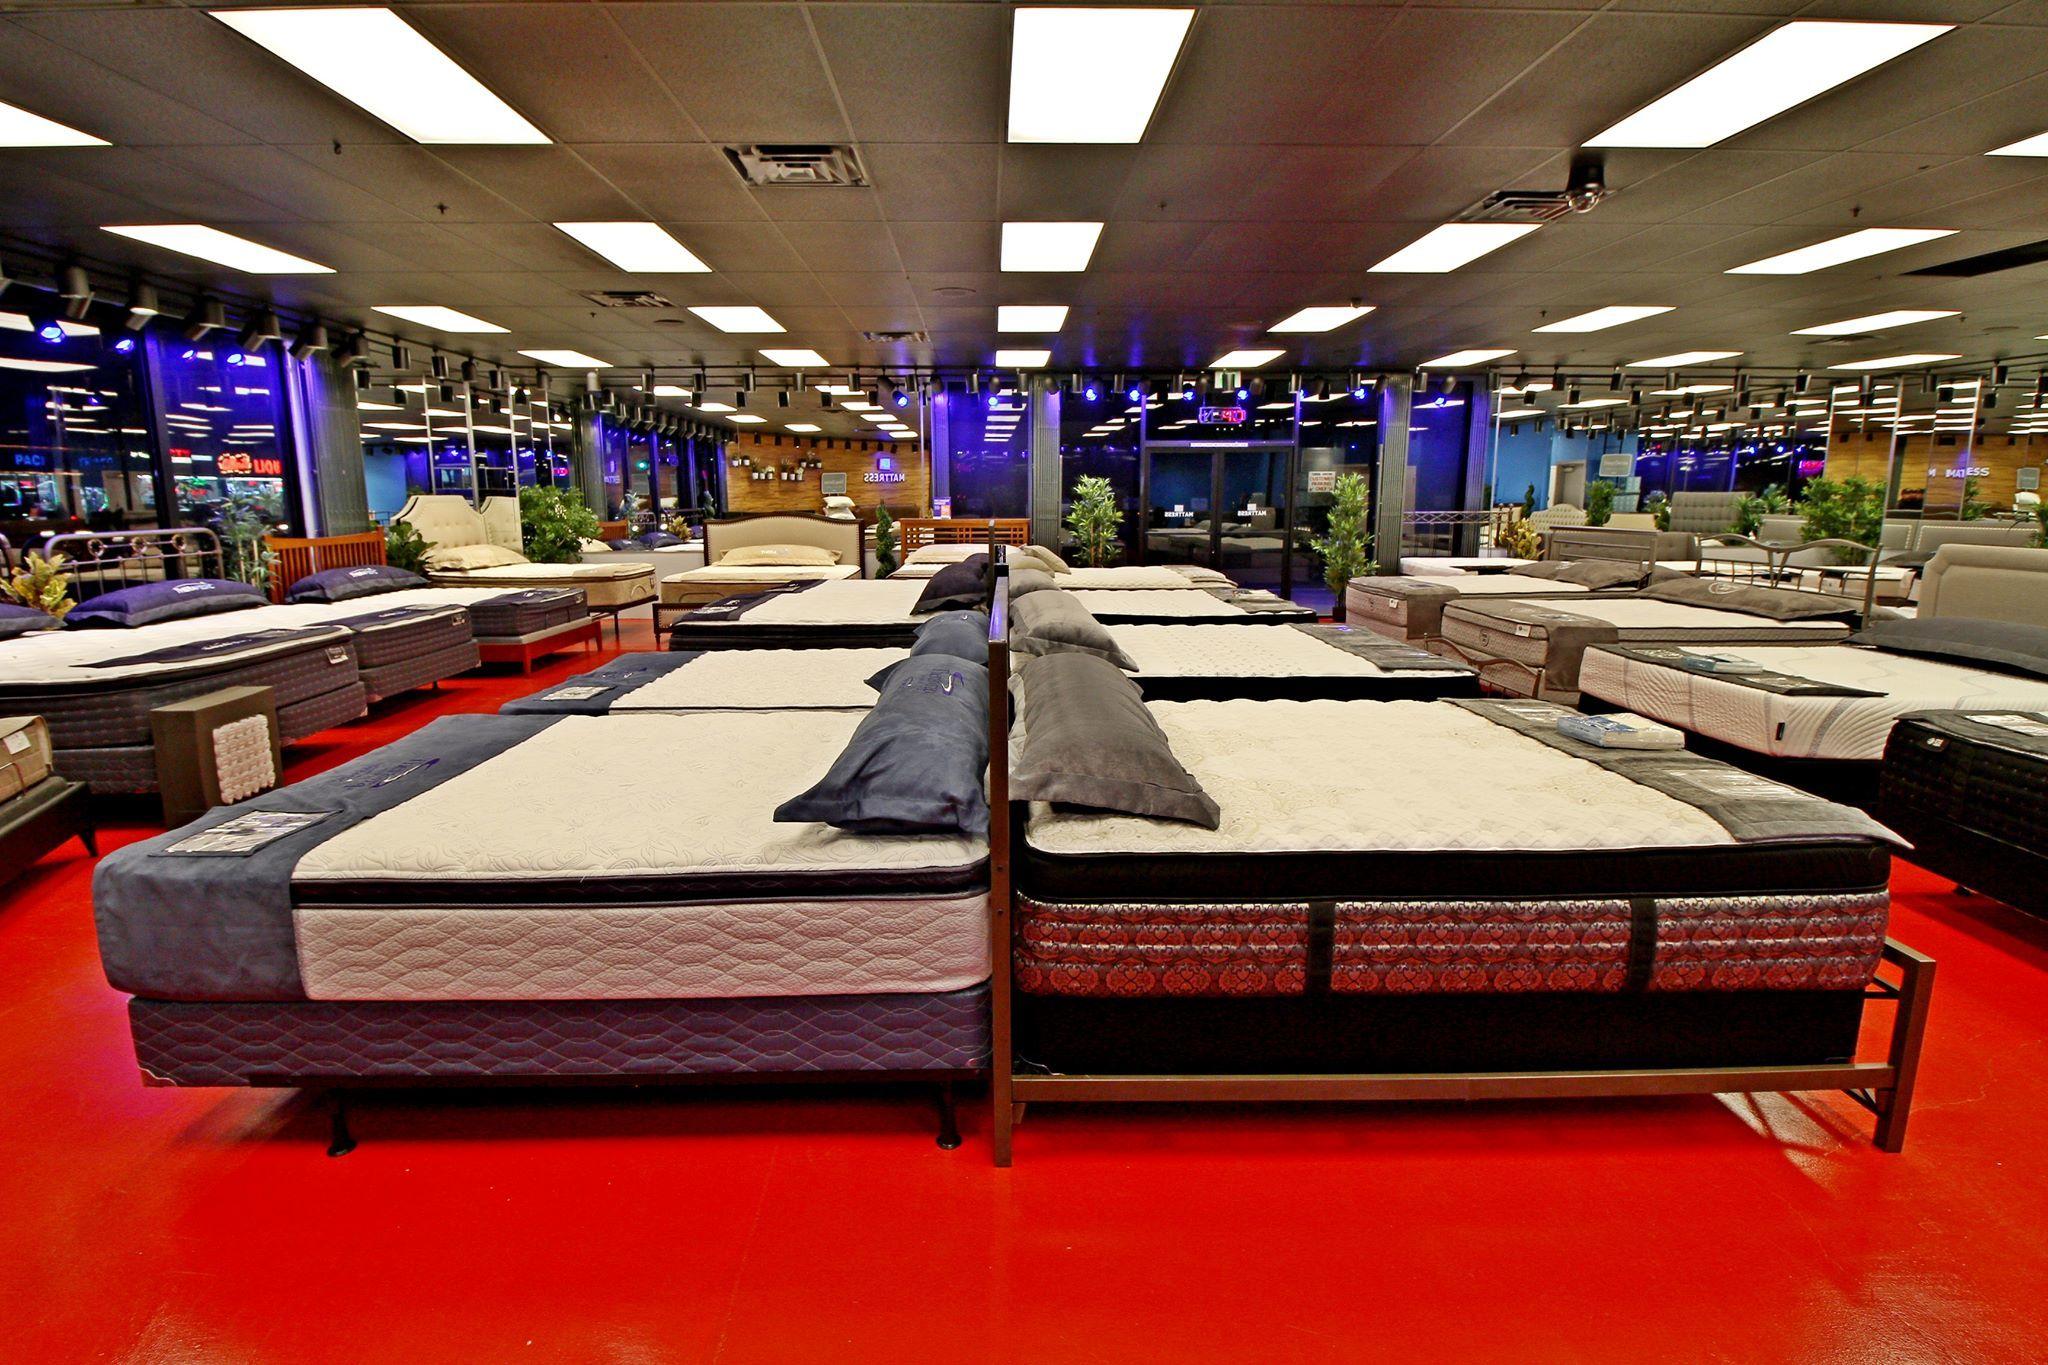 Los Angeles Mattress Stores – Natural Talalay Latex Mattress Store In Studio City Ca